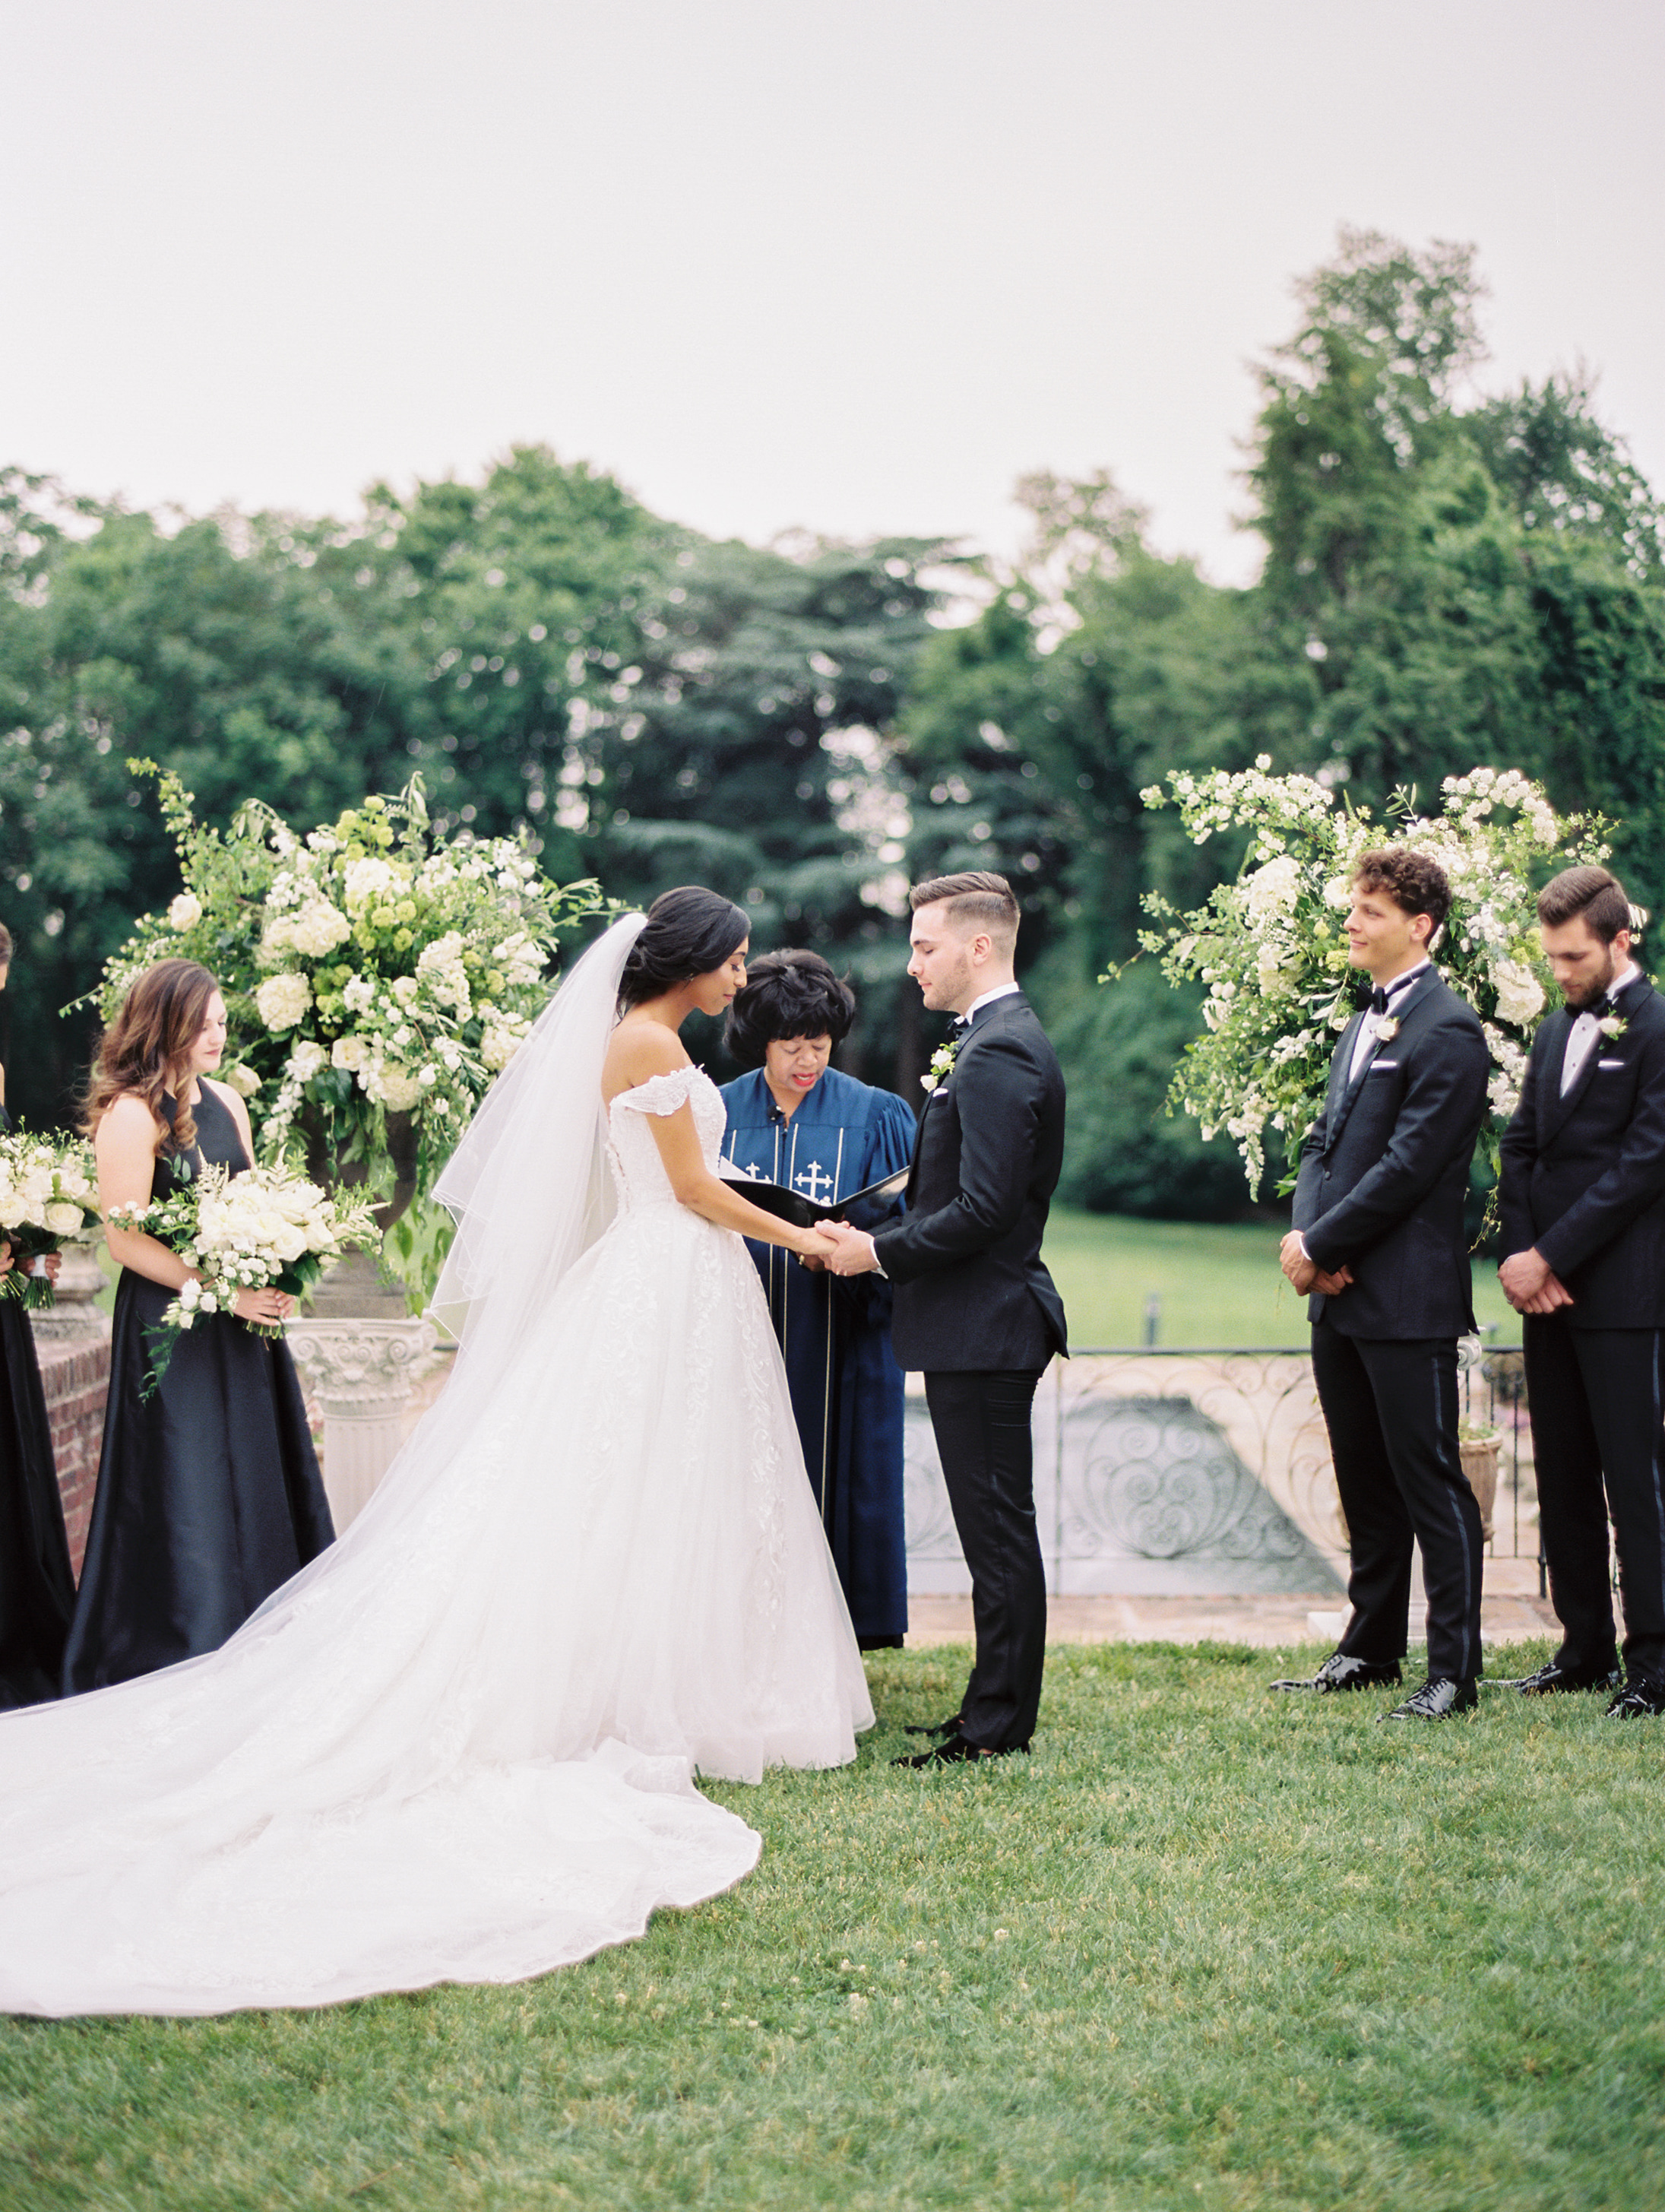 macey joshua wedding ceremony vows